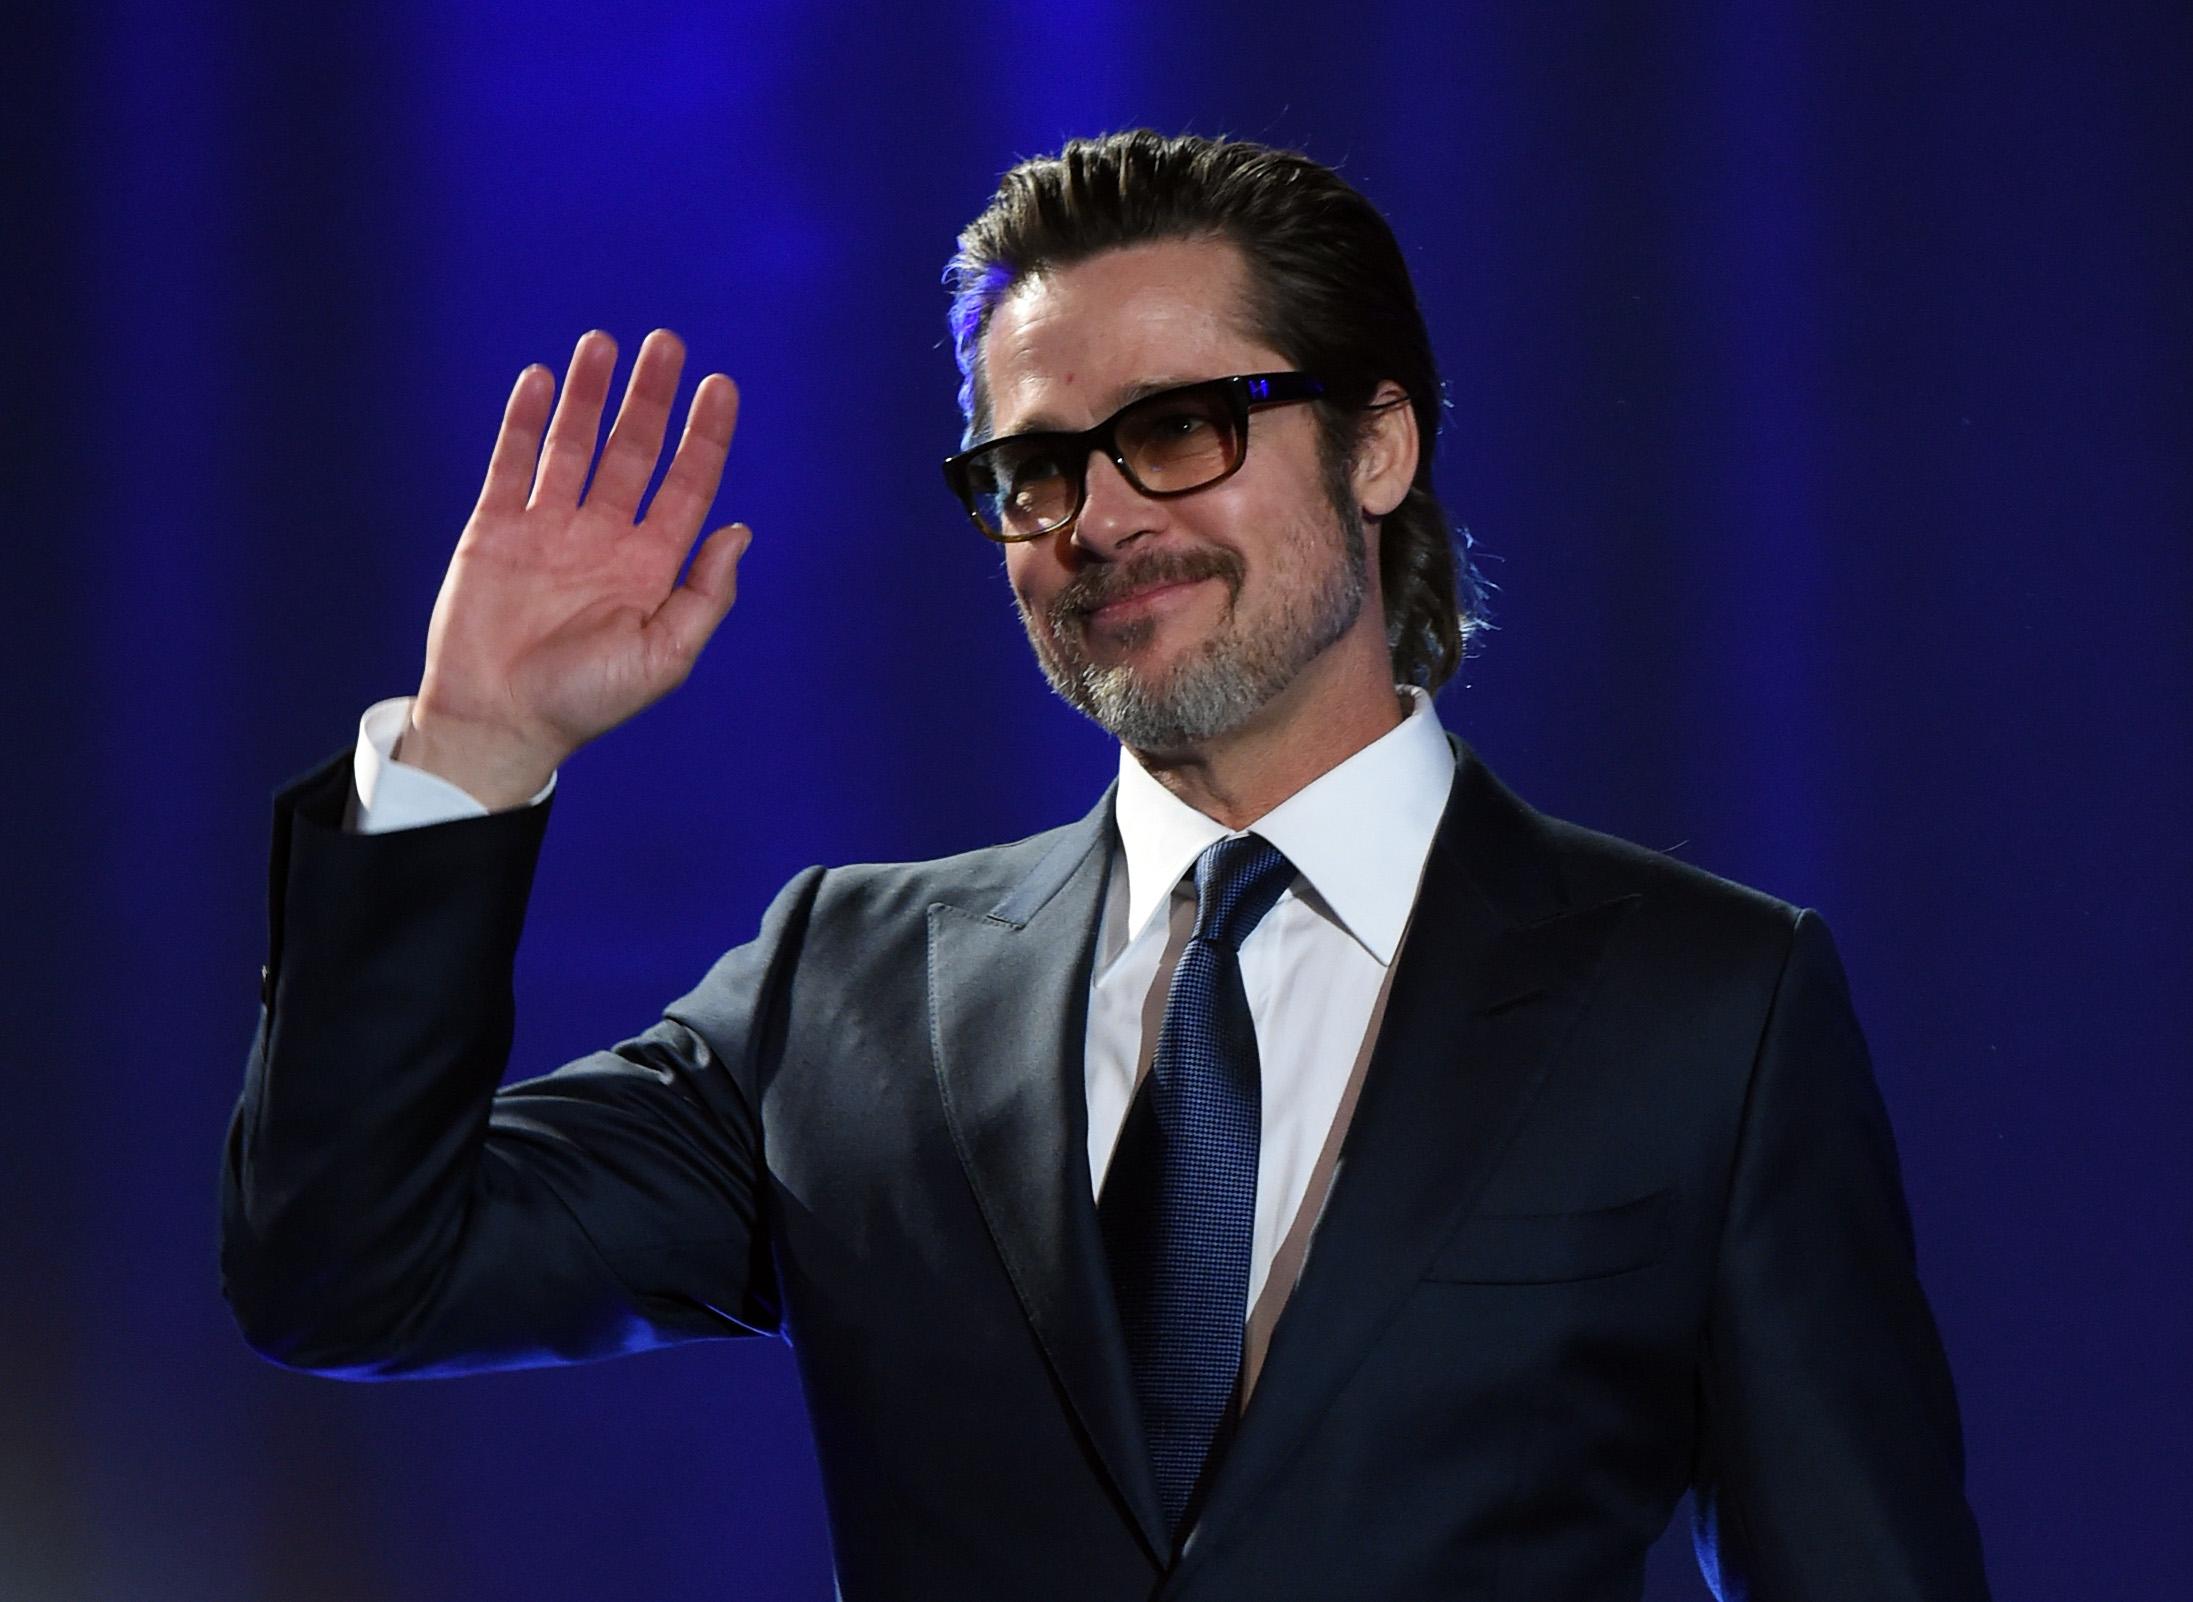 26th Annual Palm Springs International Film Festival Awards Gala – Awards Presentation